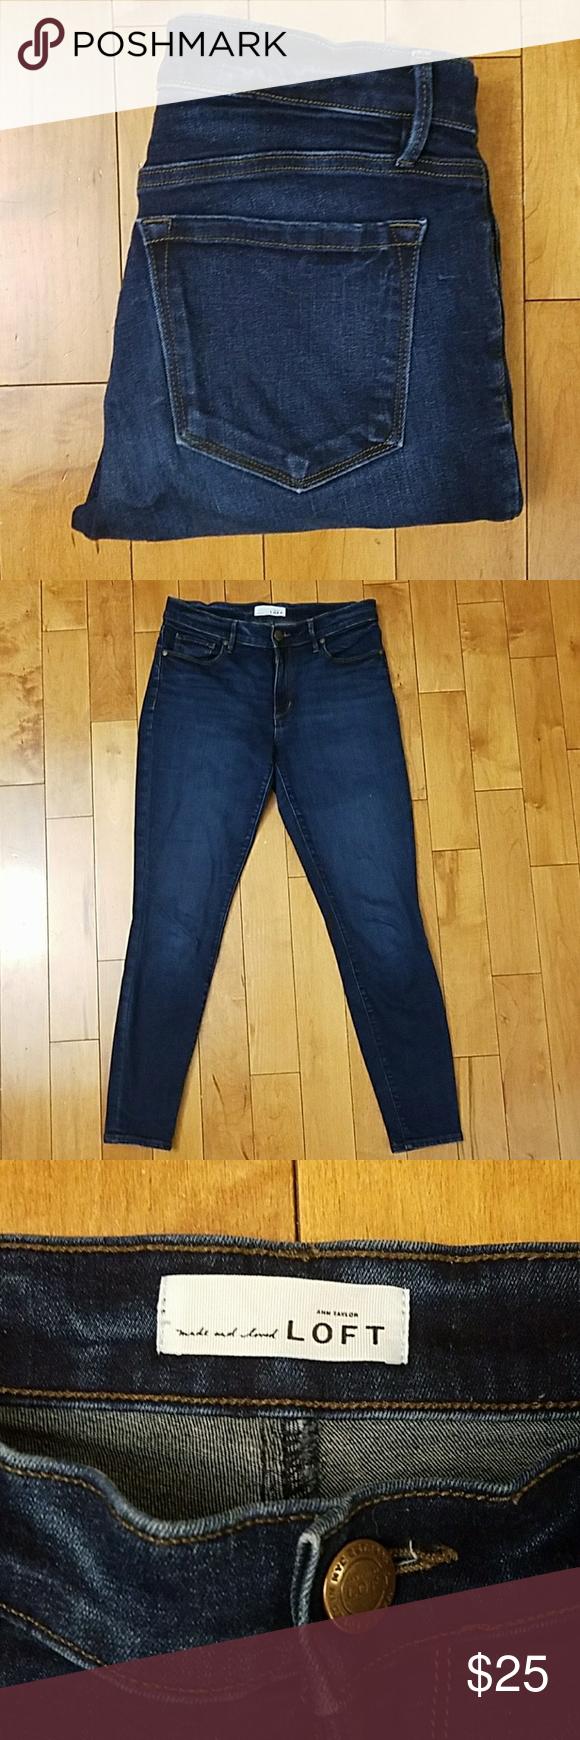 05cd21ecbddb80 Ann Taylor LOFT Legging Jeans Ann Taylor LOFT Legging Jeans. Size 28/6.  Excellent condition! 91% cotton, 7% polyester, 2% spandex. 15.25